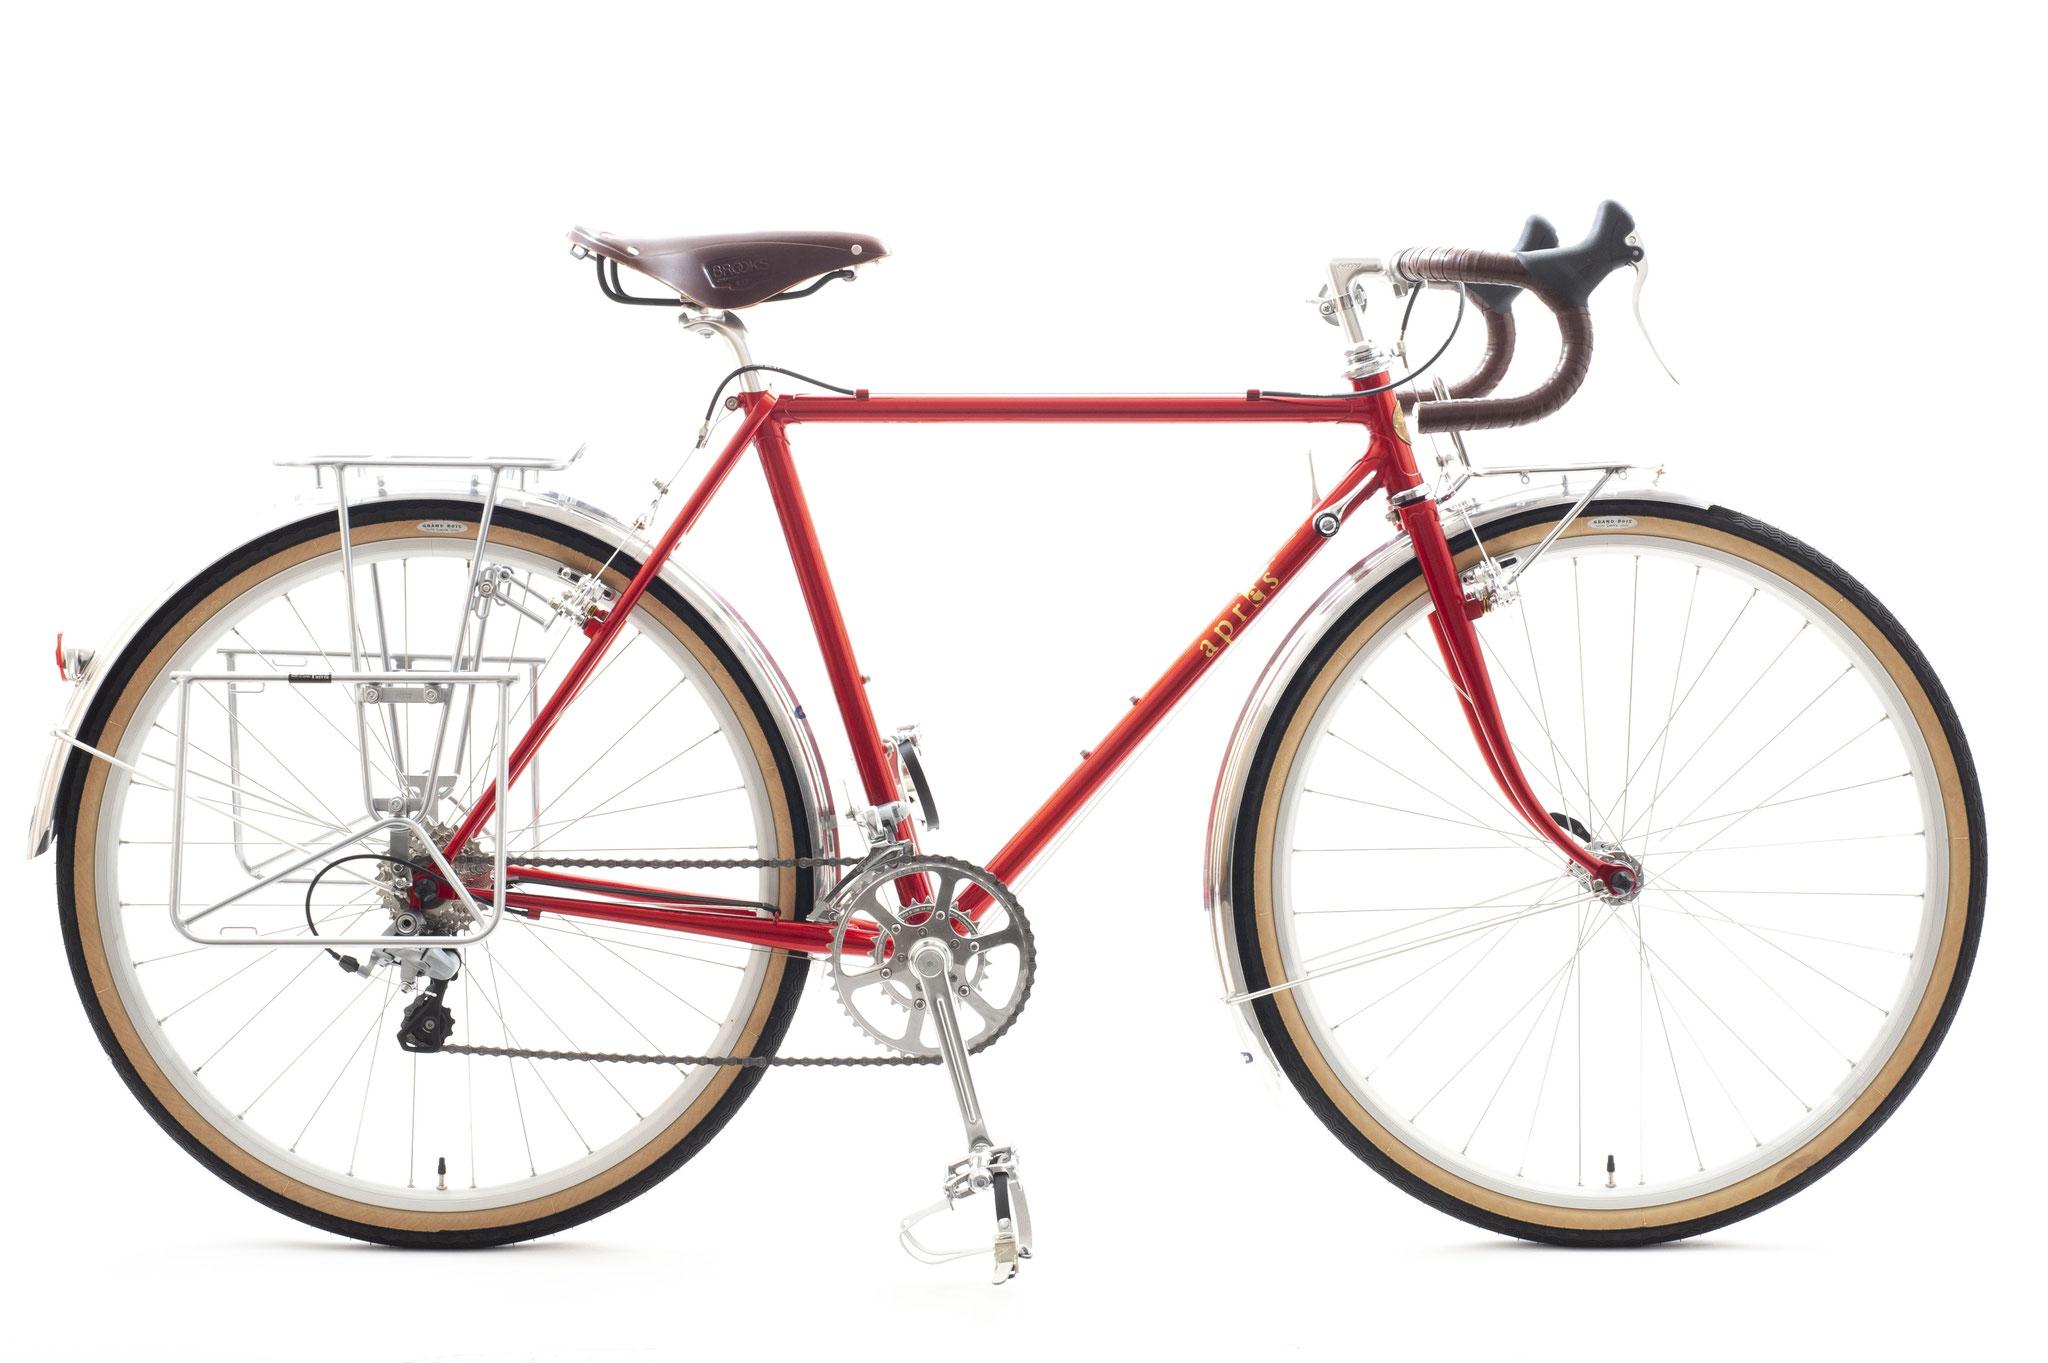 Kさんは既に乗られているスポーツバイクに合わせ、クランク長を揃えて170㎜にするなど、細かくご希望をいただきました。下ハンからブレーキレバーへ指が届きやすいようにとのチョイスもご要望通りです。バーテープとサドルの色はフレームが塗り上がってからご来店されて決められました。